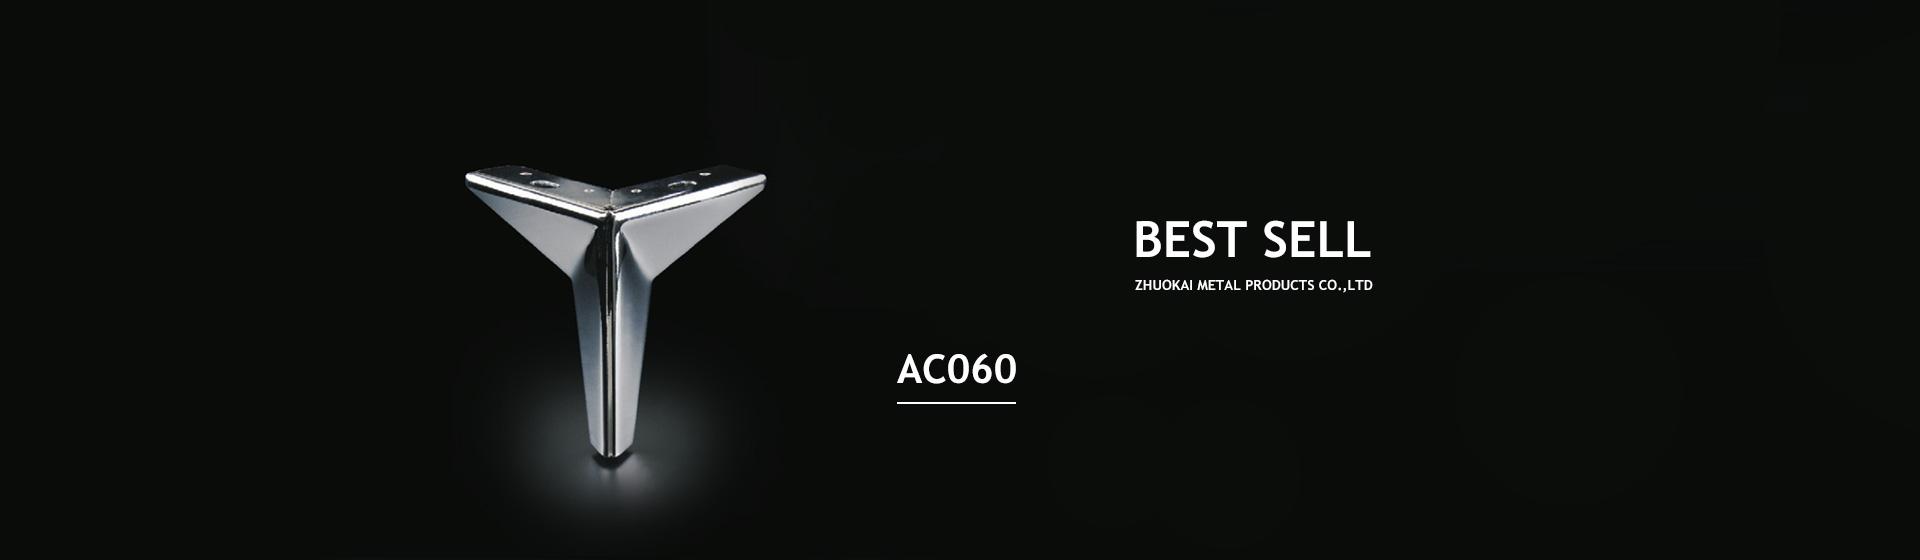 AC060